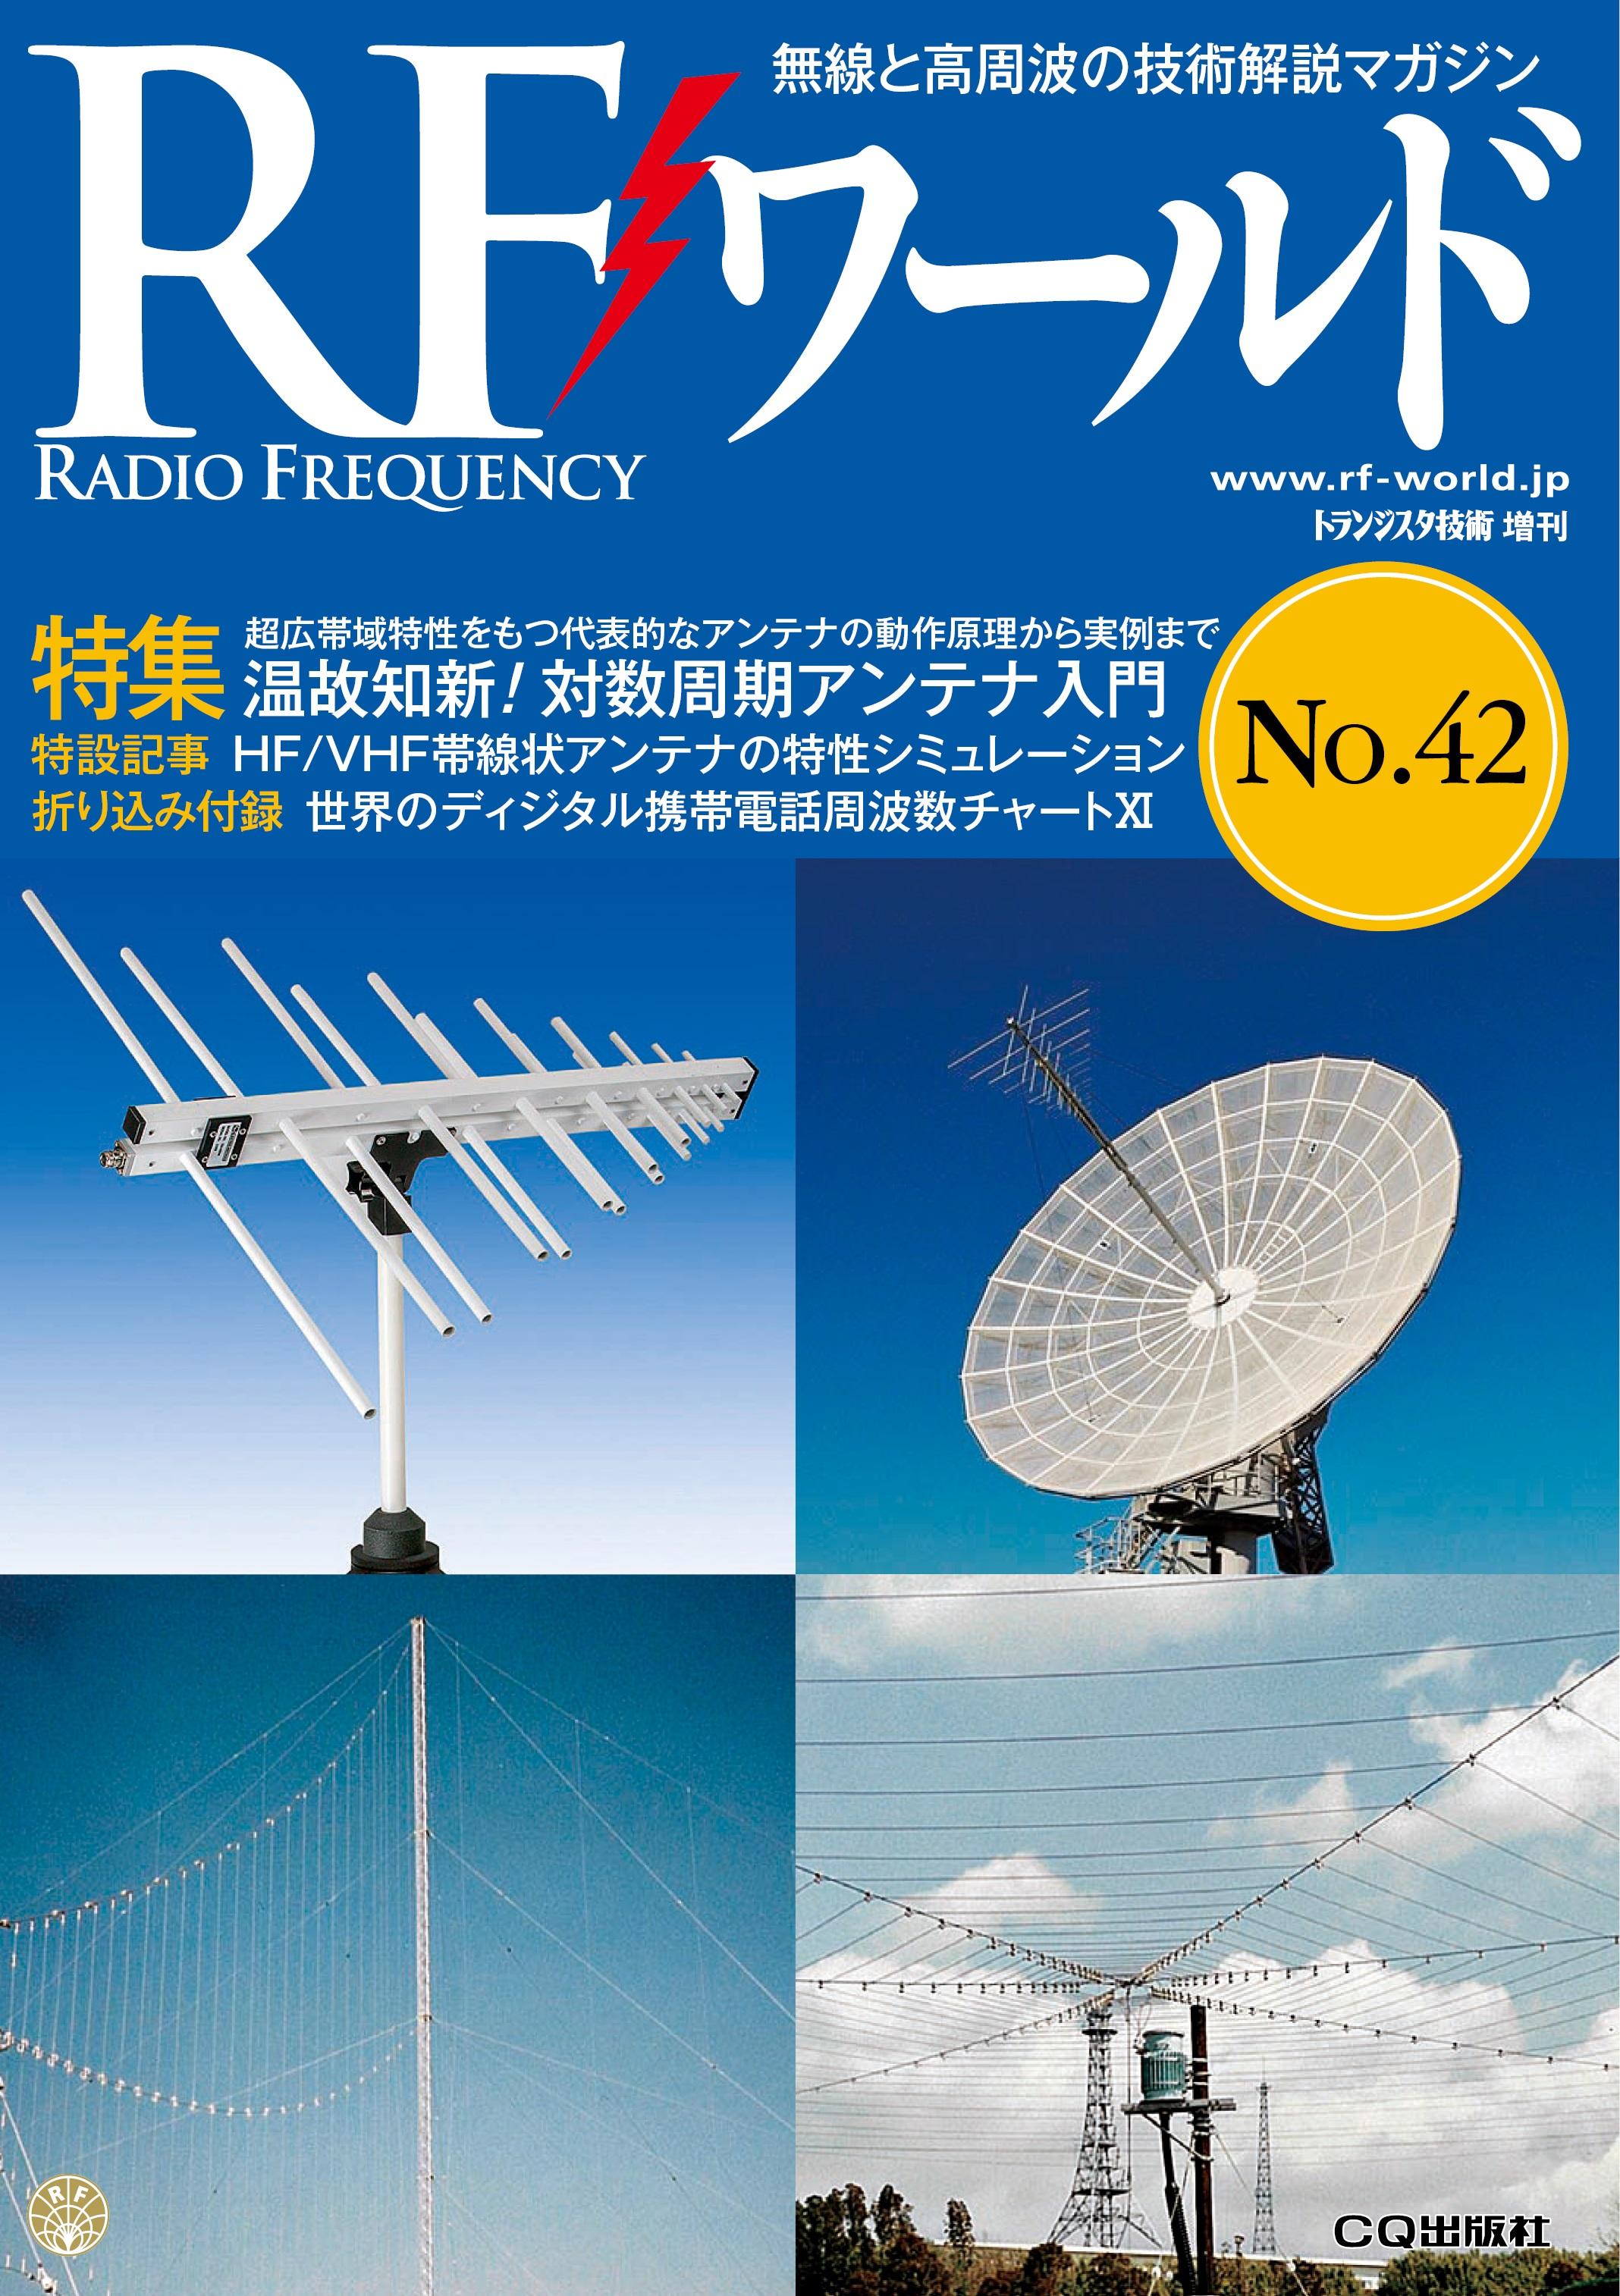 RFワールド No 42 温故知新!対数周期アンテナ入門【PDF版】 | Tech